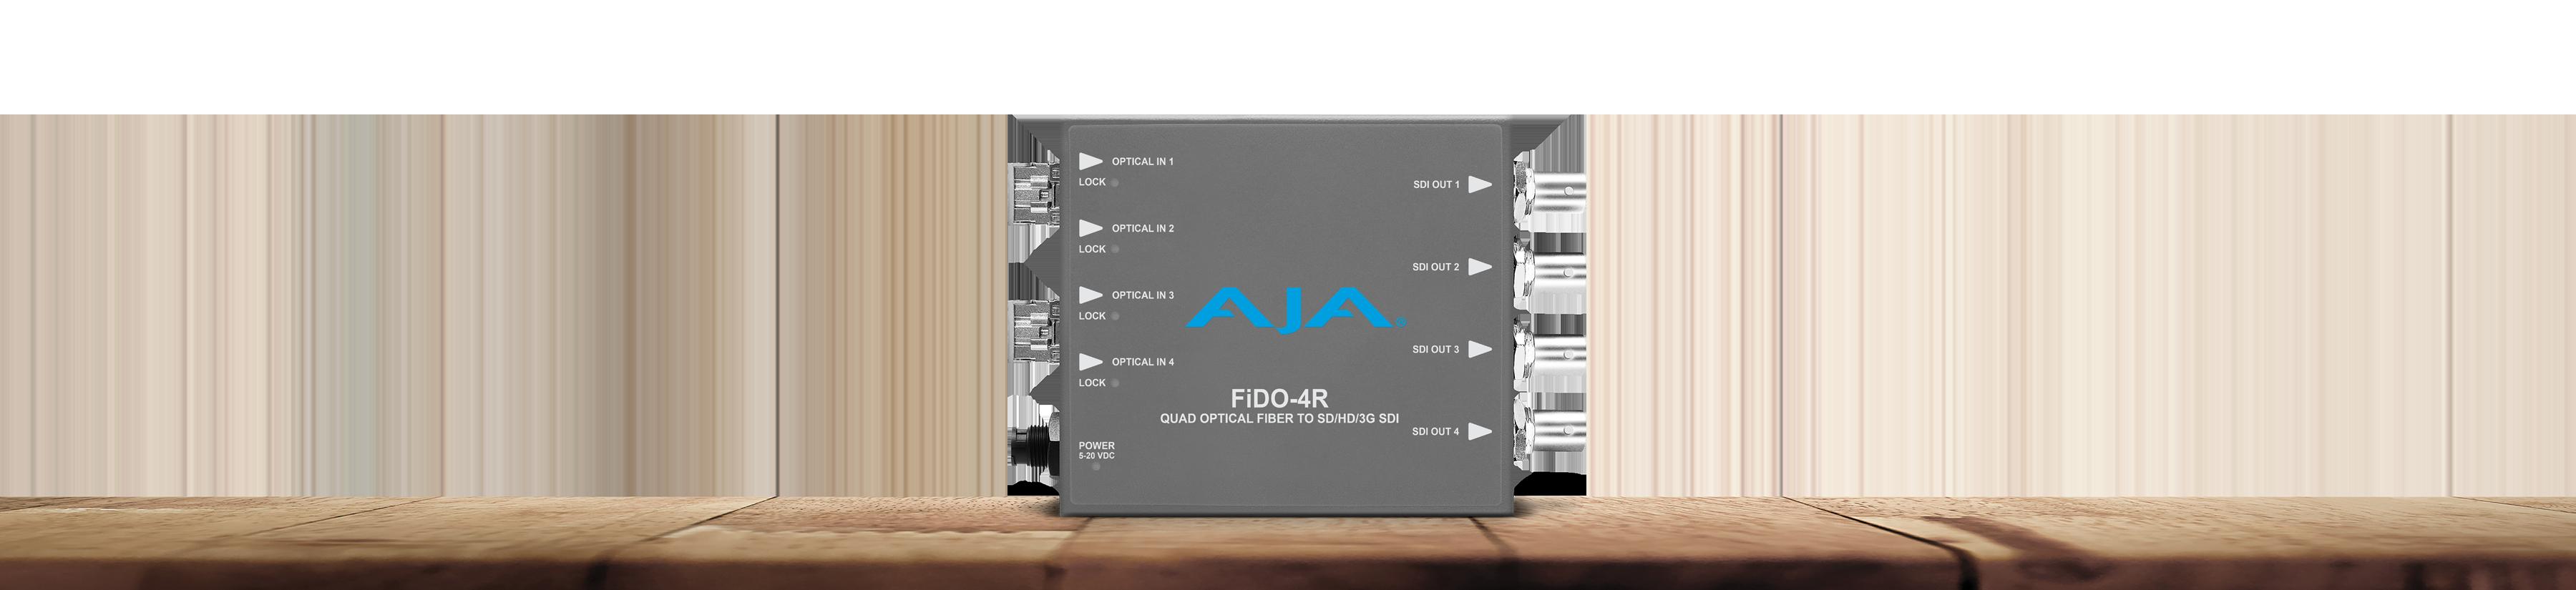 FiDO-4R-MM